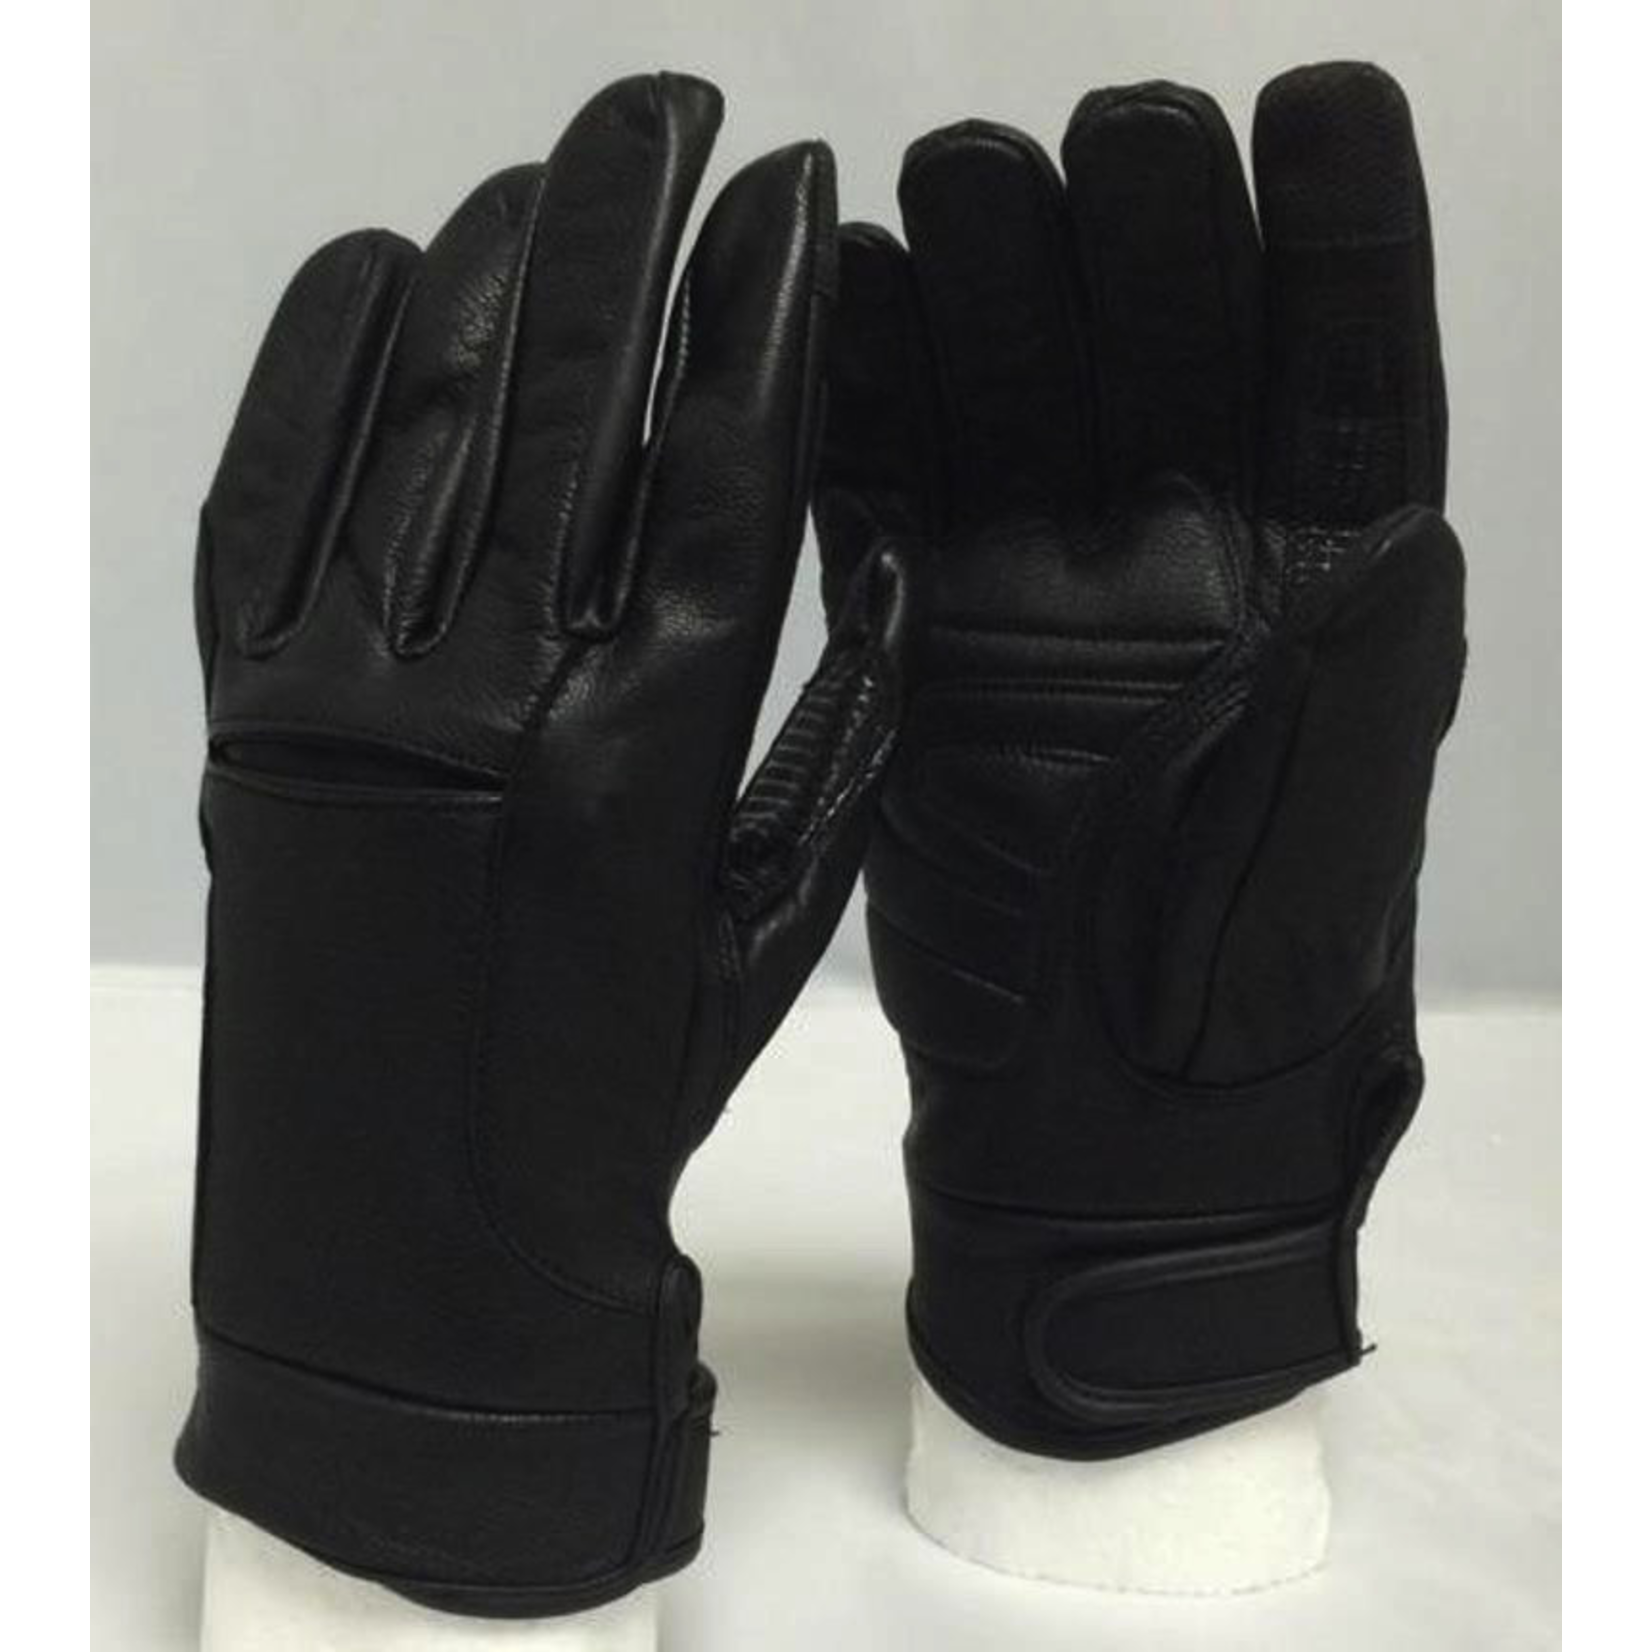 Apparel Glove, Leather Cruiser